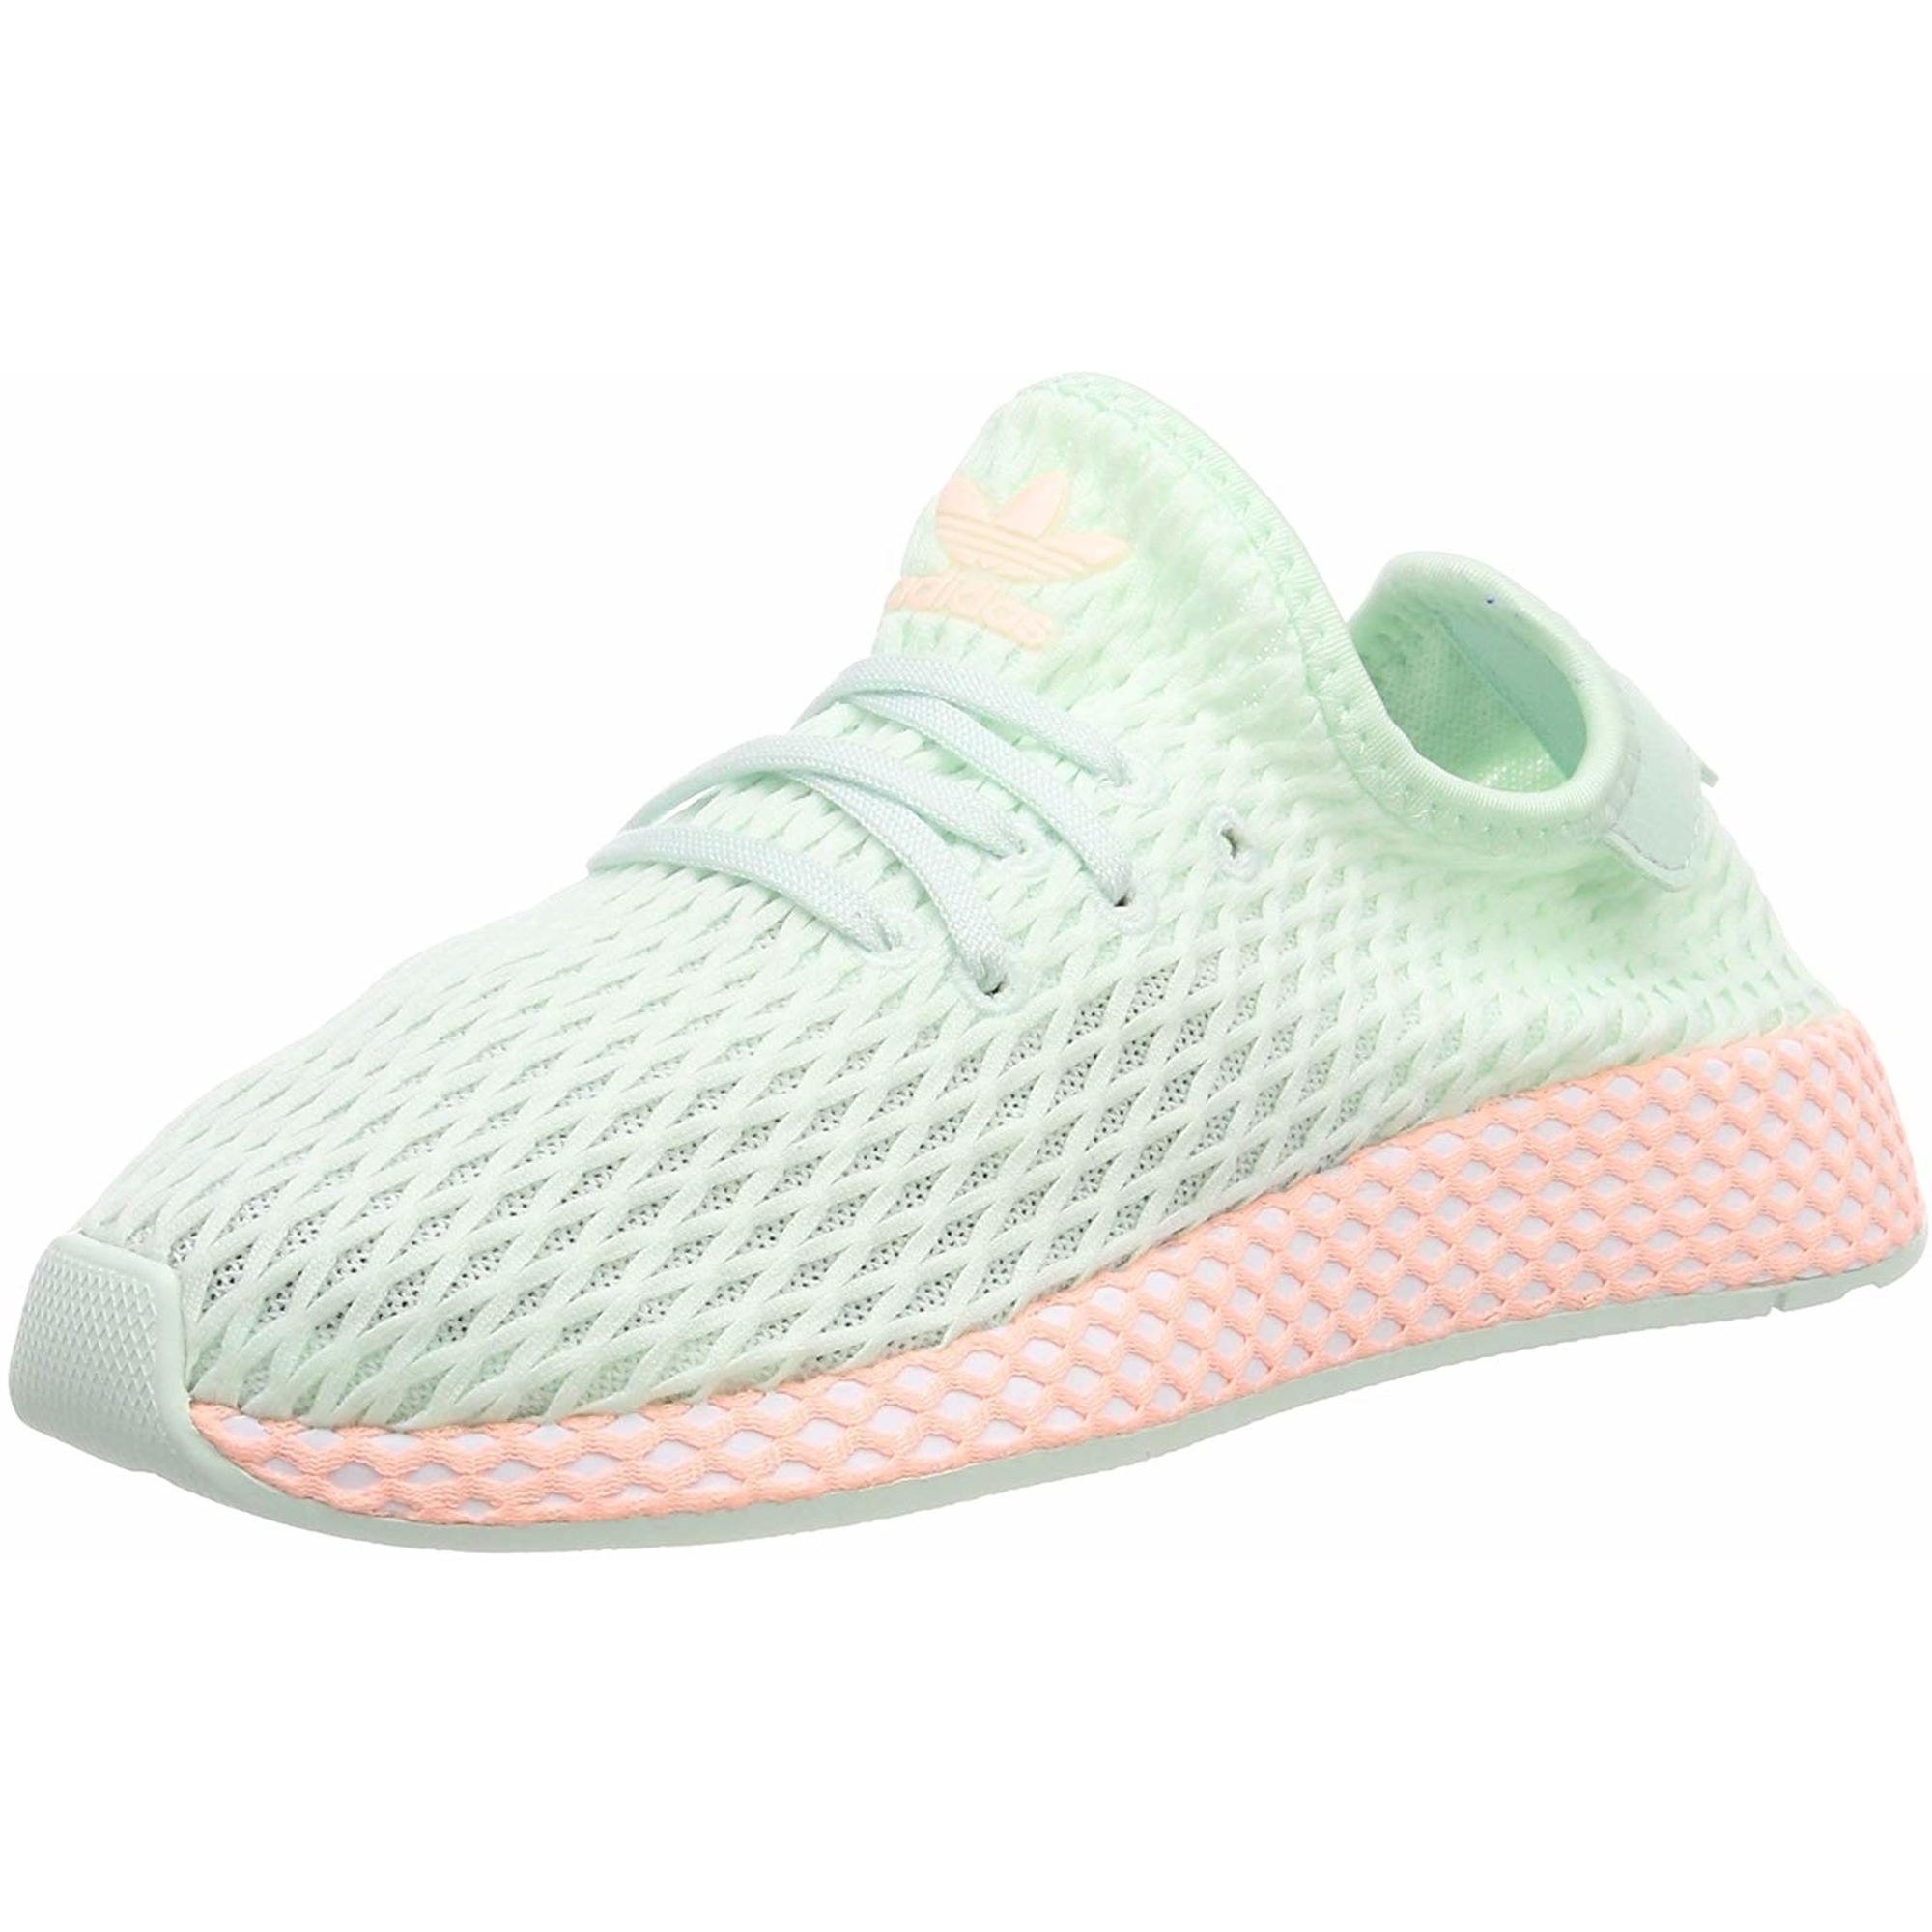 Scarpe Adidas Online Prezzi Bassi Originals Deerupt Runner